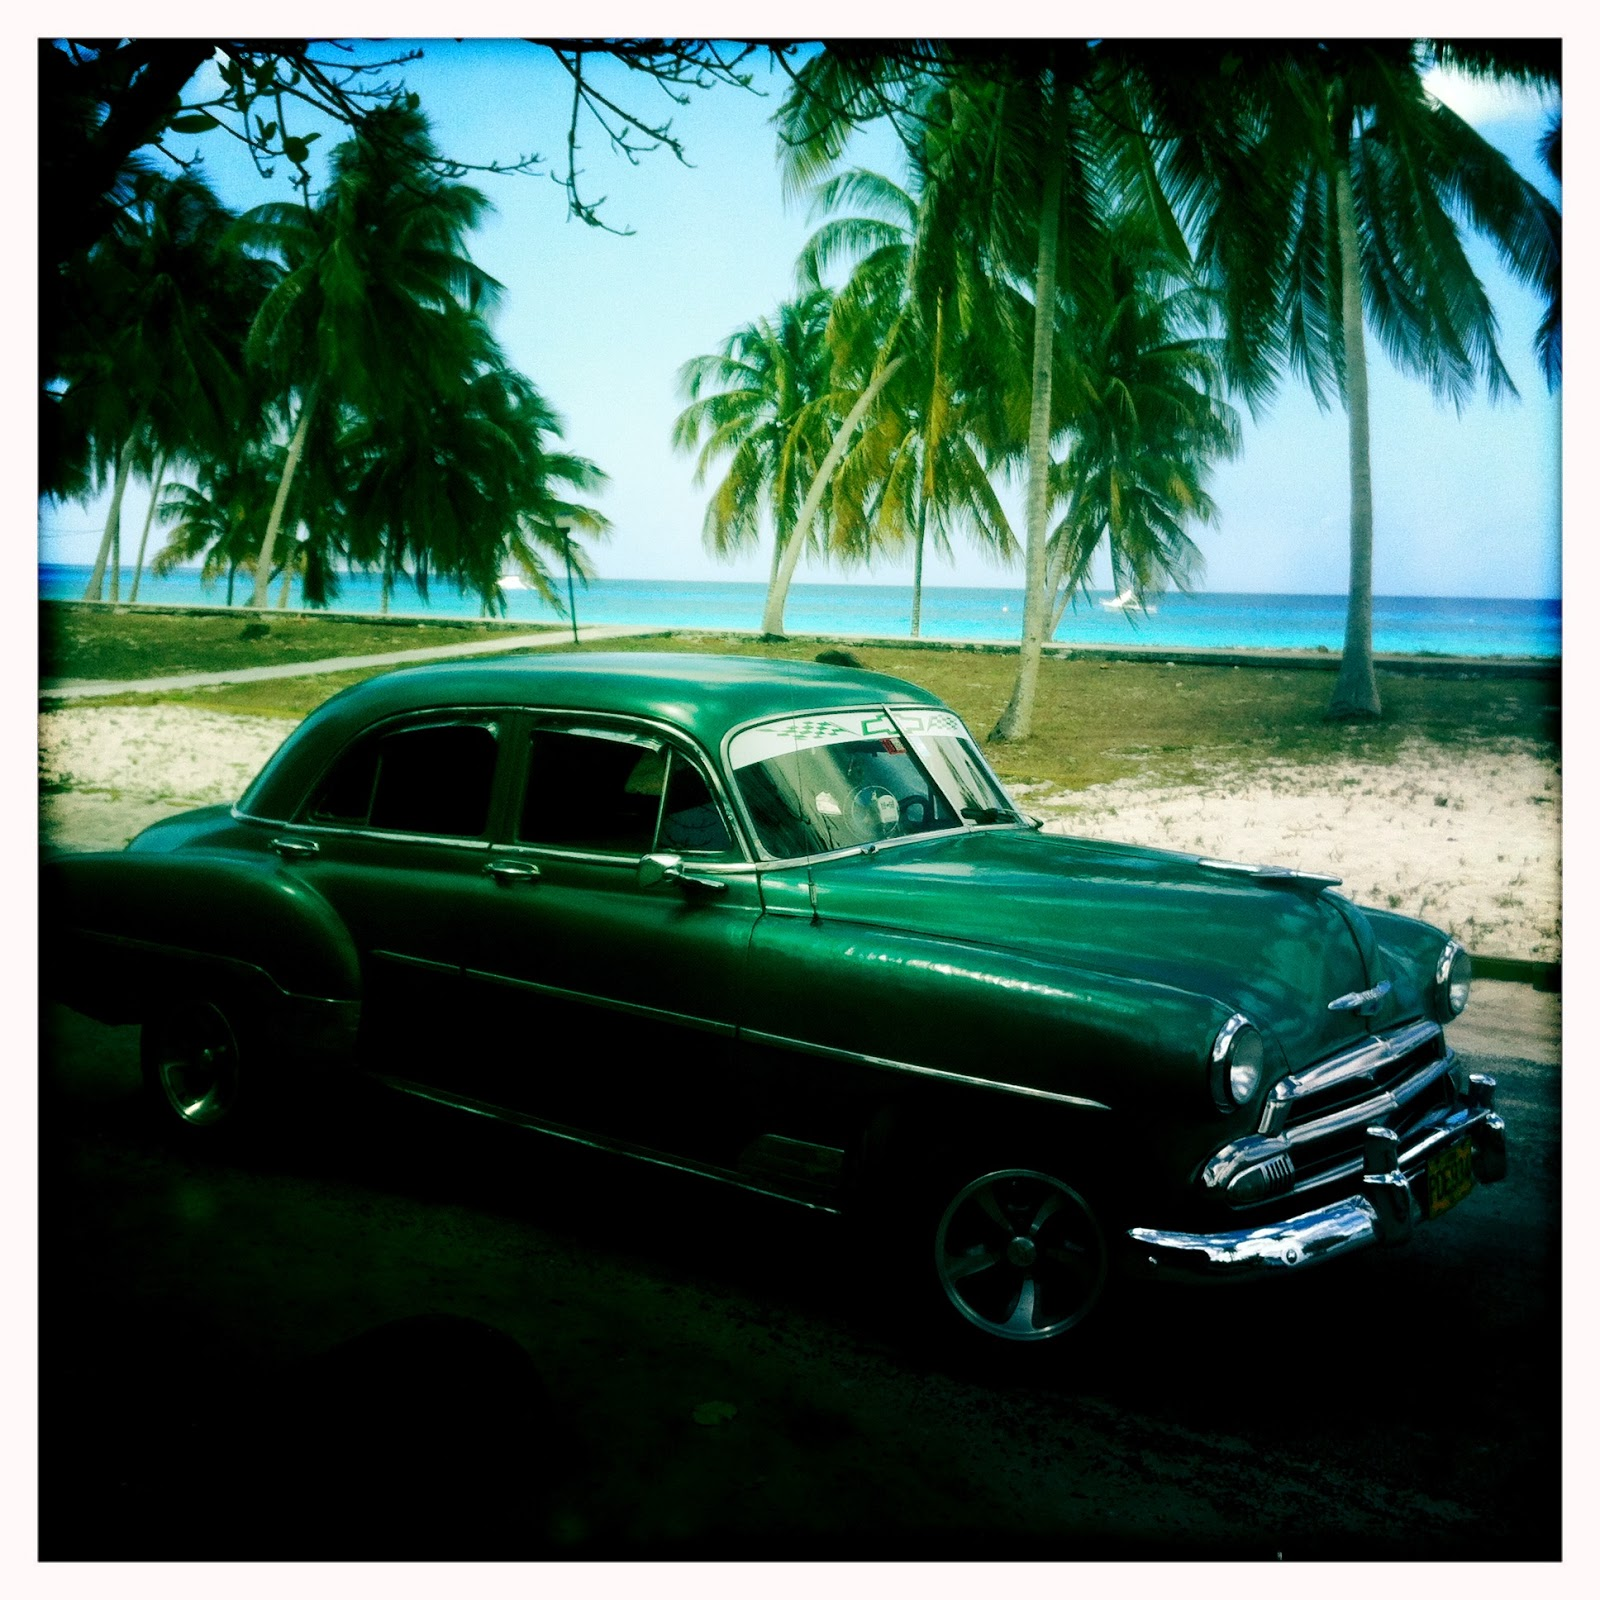 Sea Ya Beaches: 2013